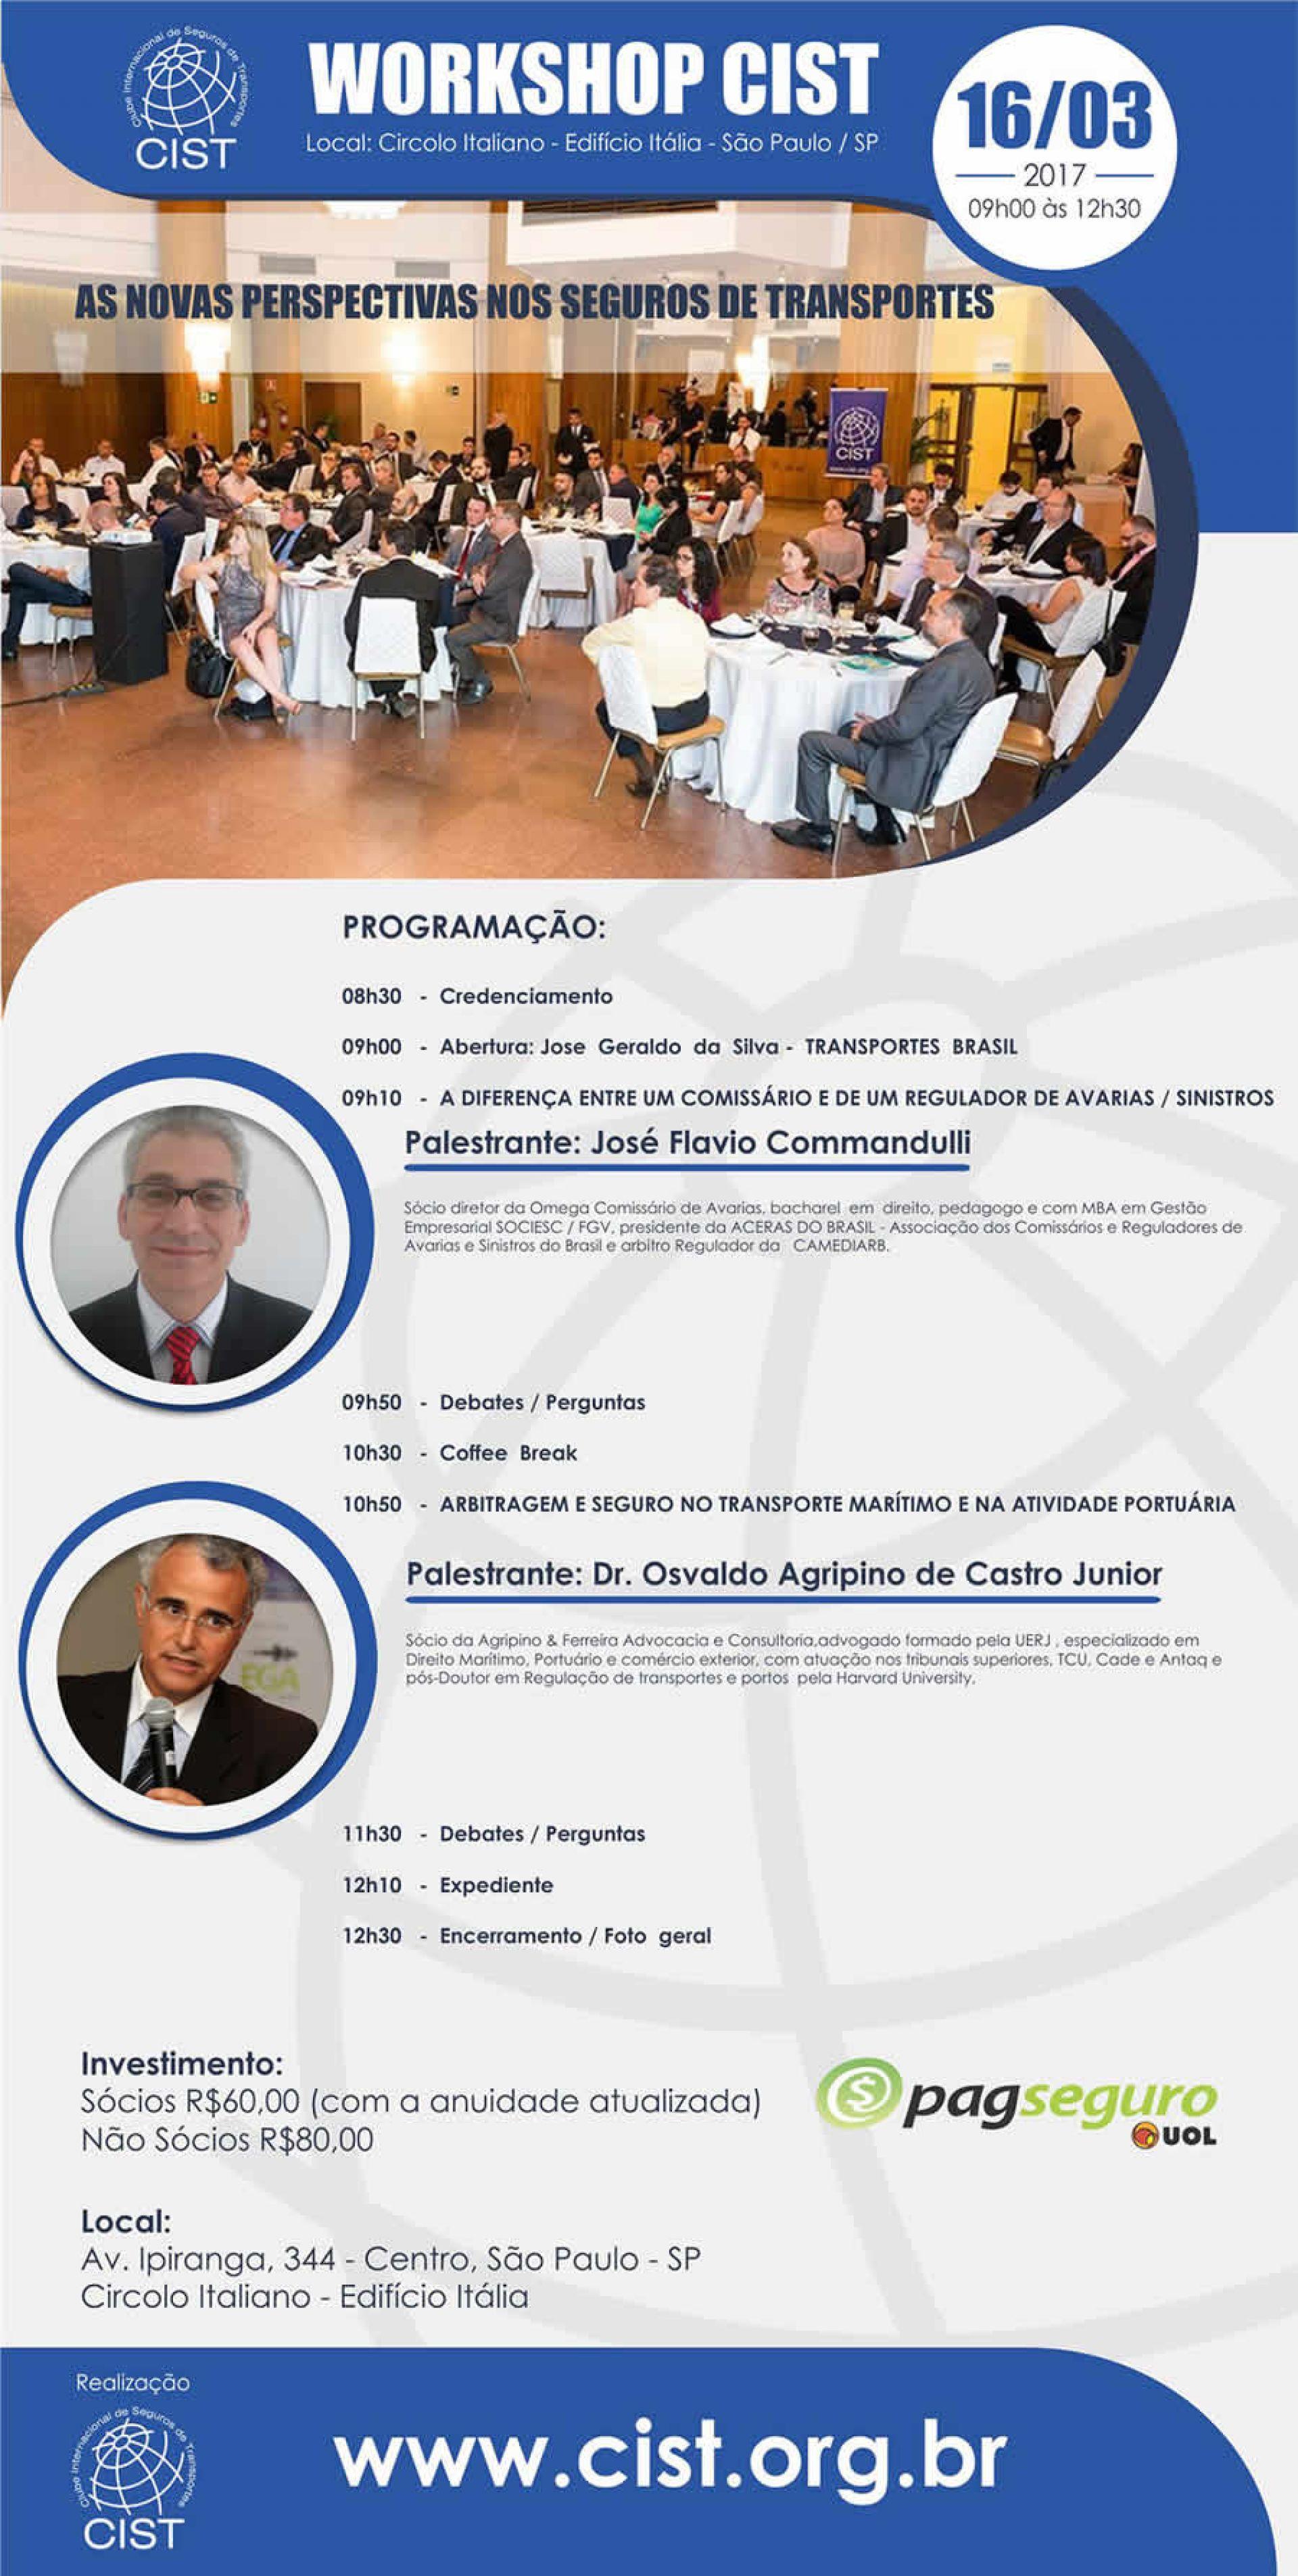 Workshop Cist no próximo dia 16 de março